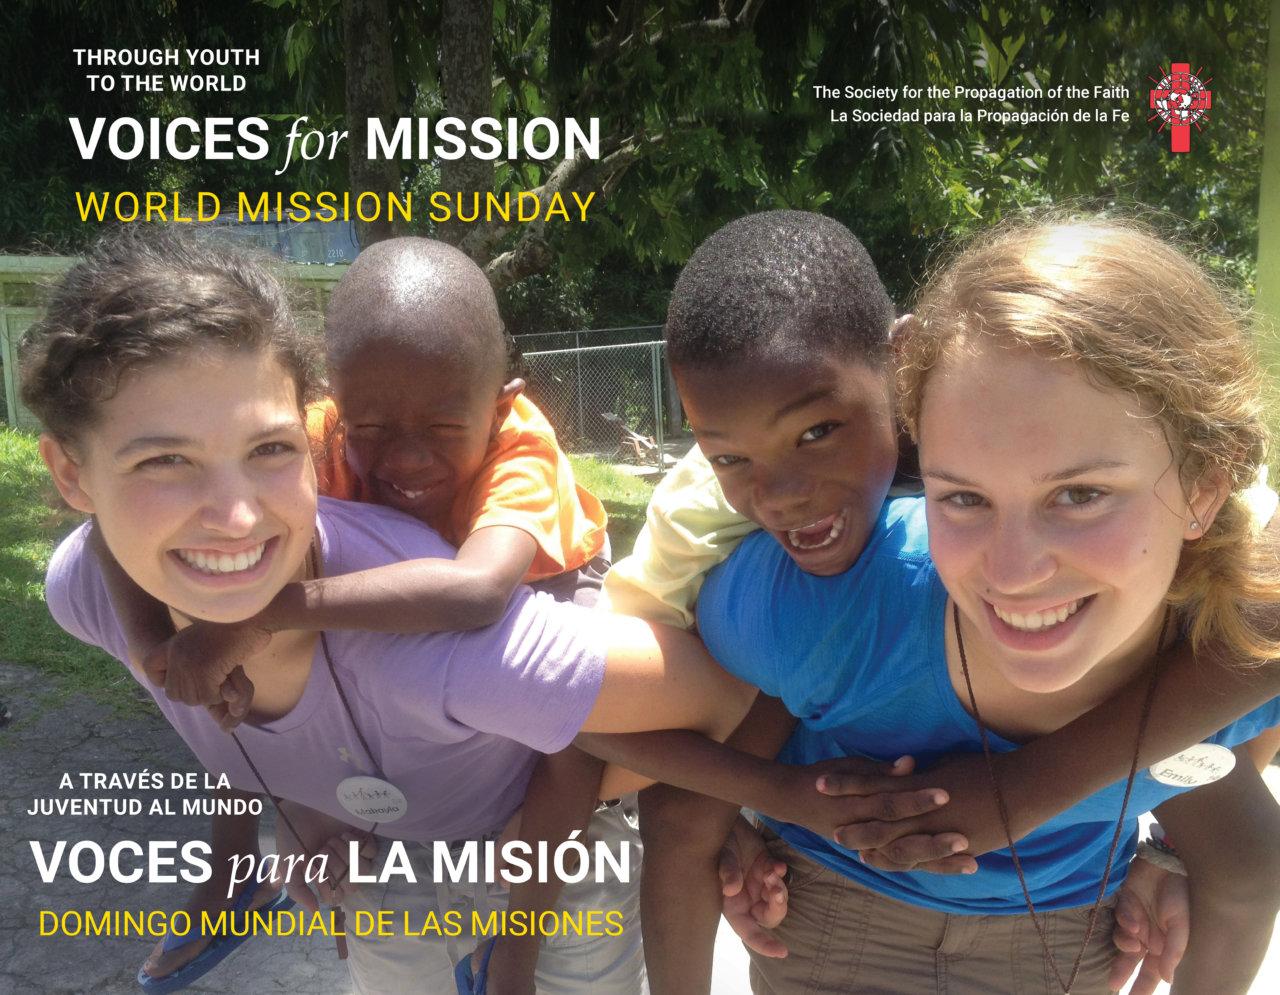 World Mission Sunday 2018 poster image